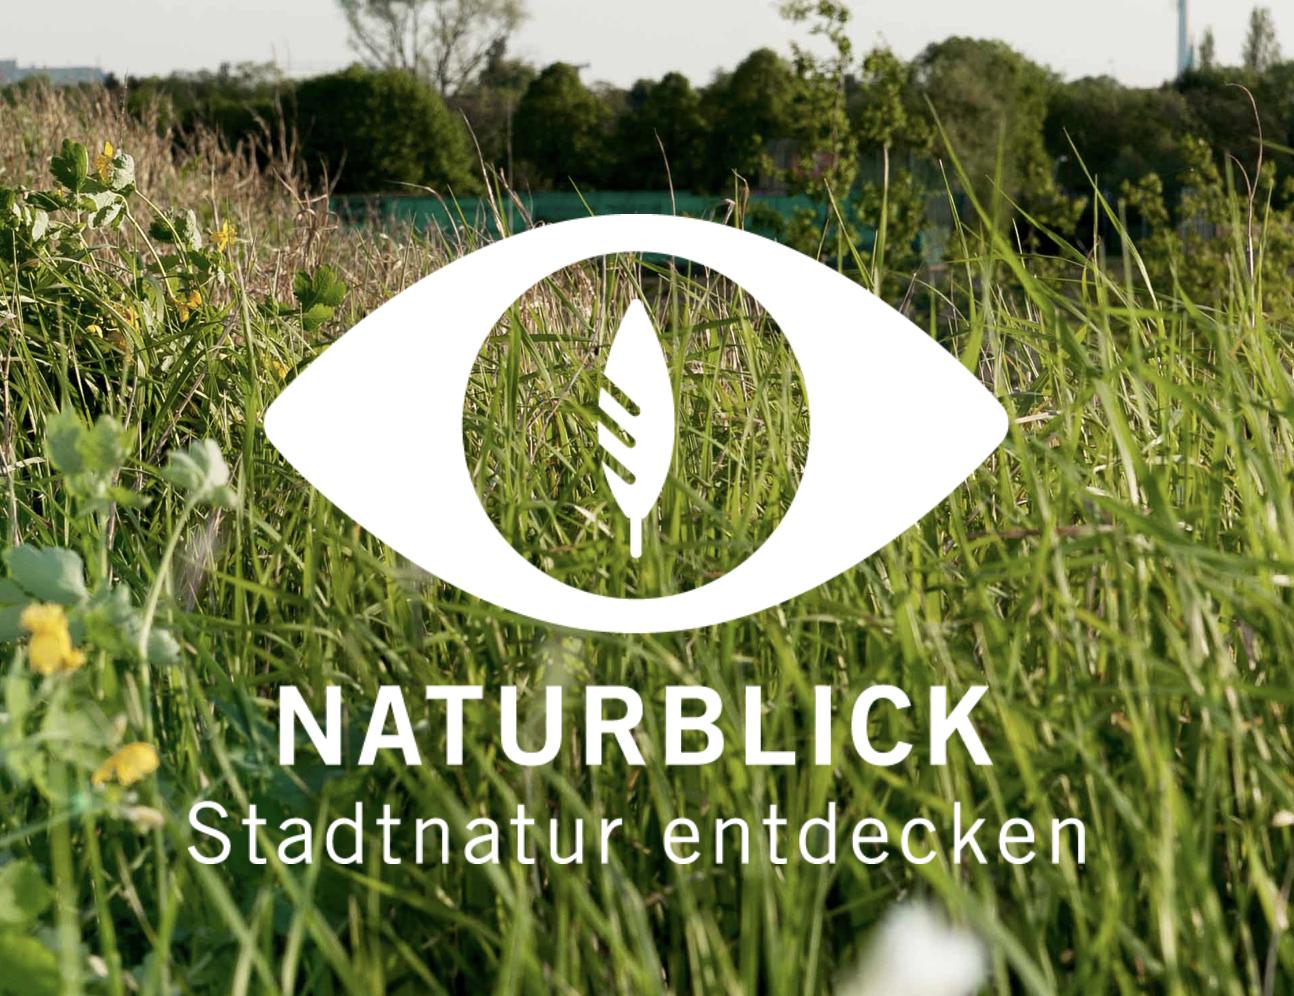 Naturblick